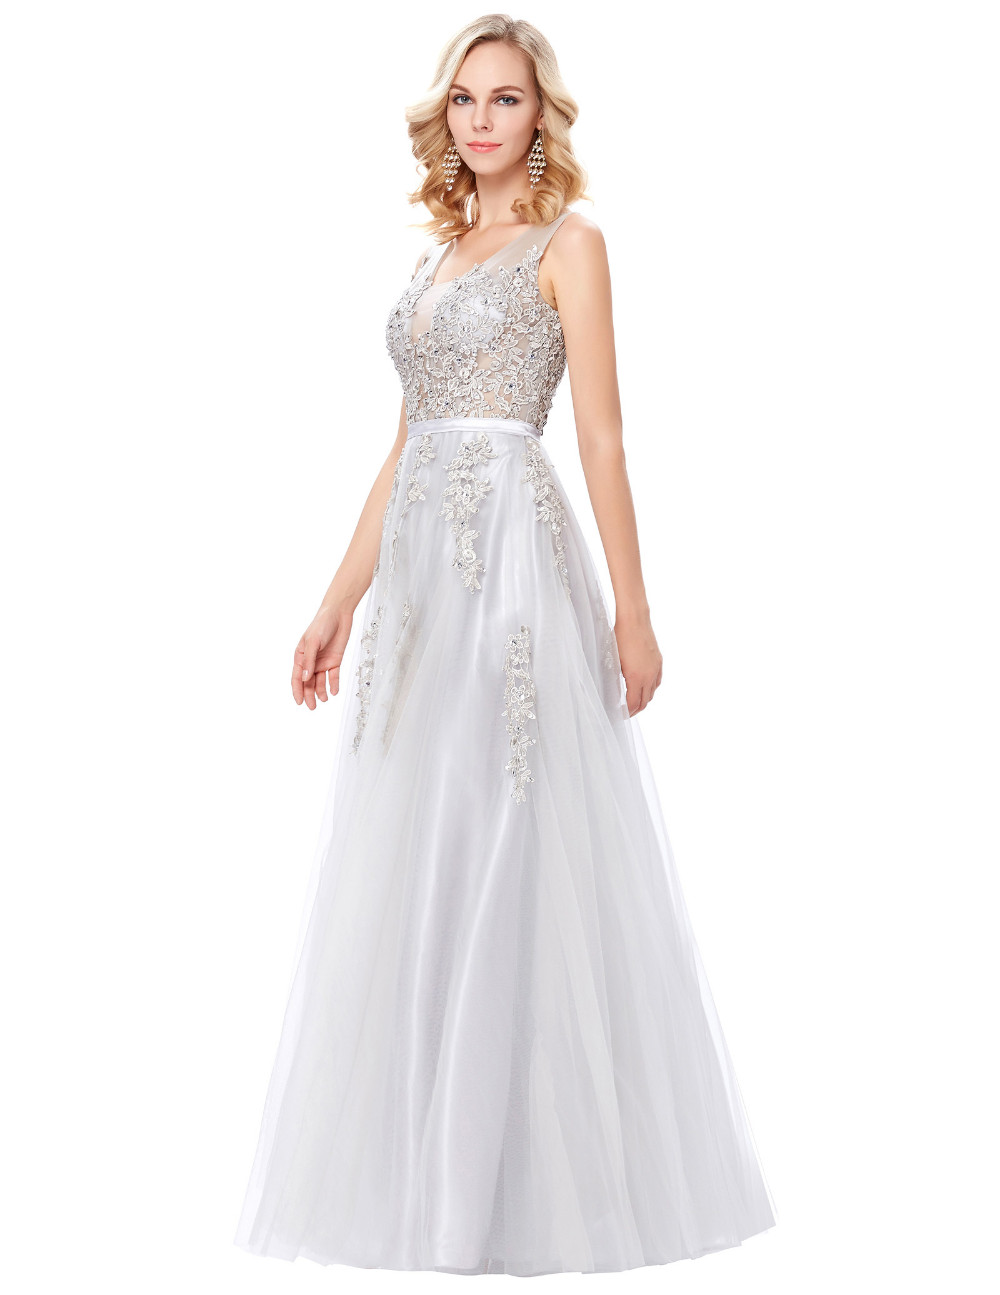 Grace Karin Tulle Appliques Celebrity Prom Dress Sexy V Back Sleeveless Long Royal Blue Robes De Soiree 2017 Longue Prom Dresses 19